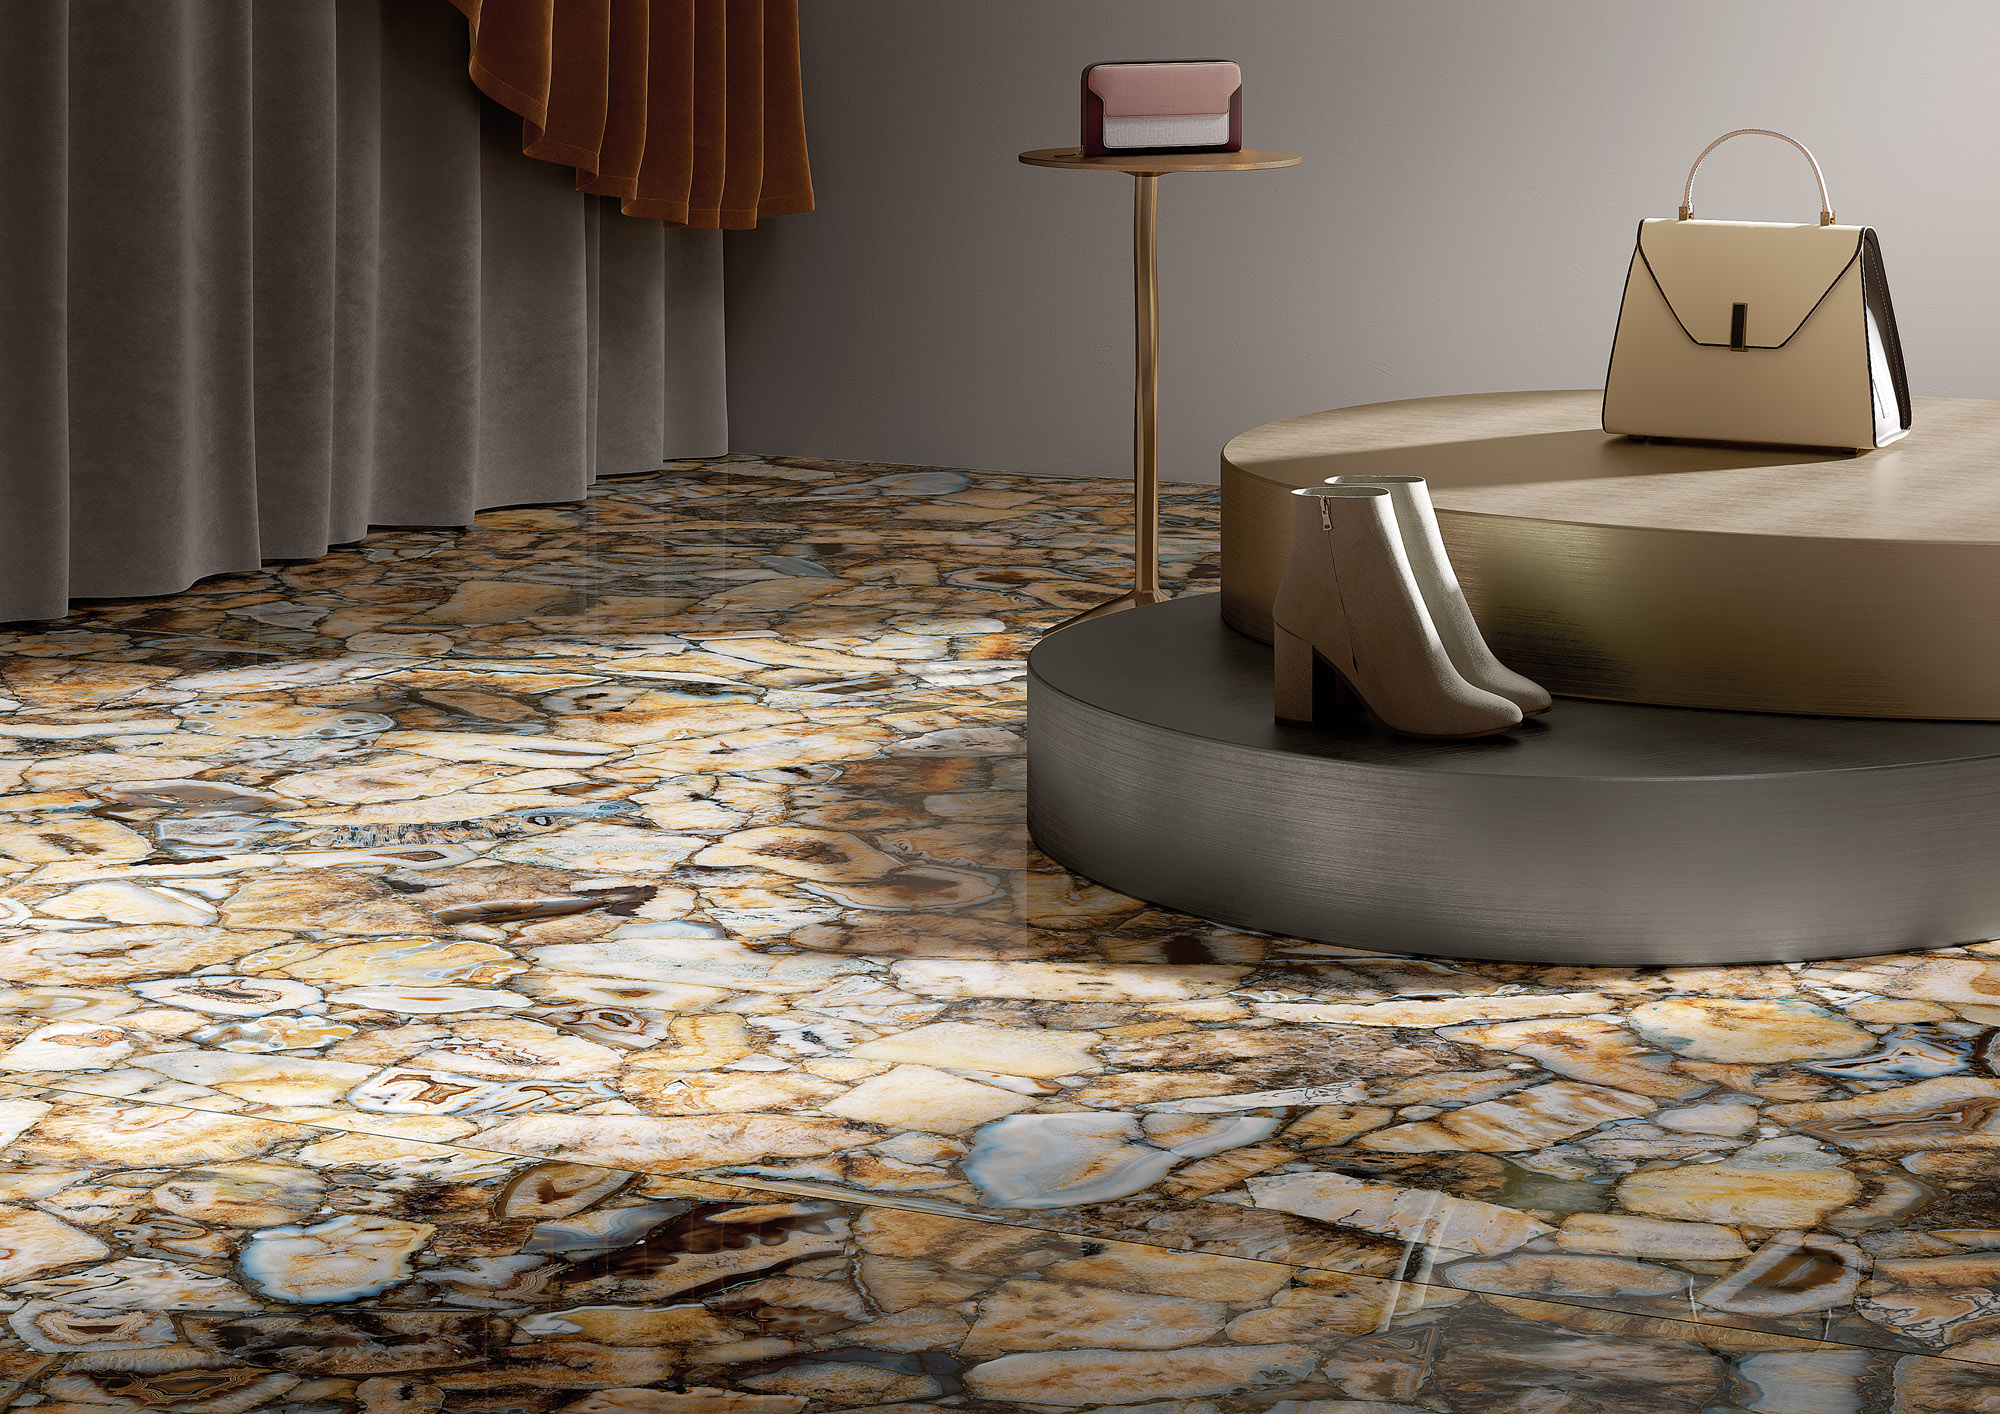 porcelain tile images: Gem Stone range high quality photo